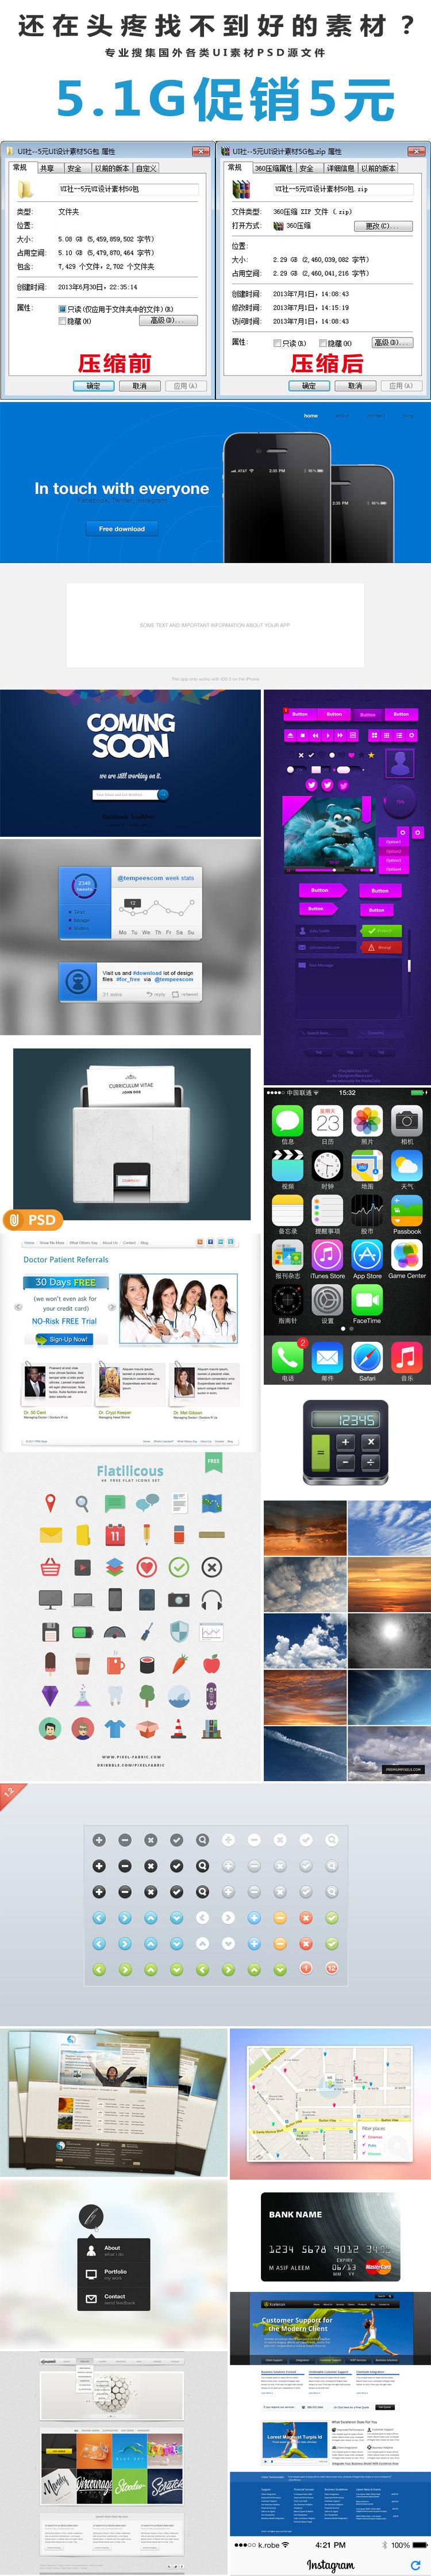 [UI社出品]5.10G 超大精选UI设计素材,手机UI界面psd素材-第一季 素材包-第1张